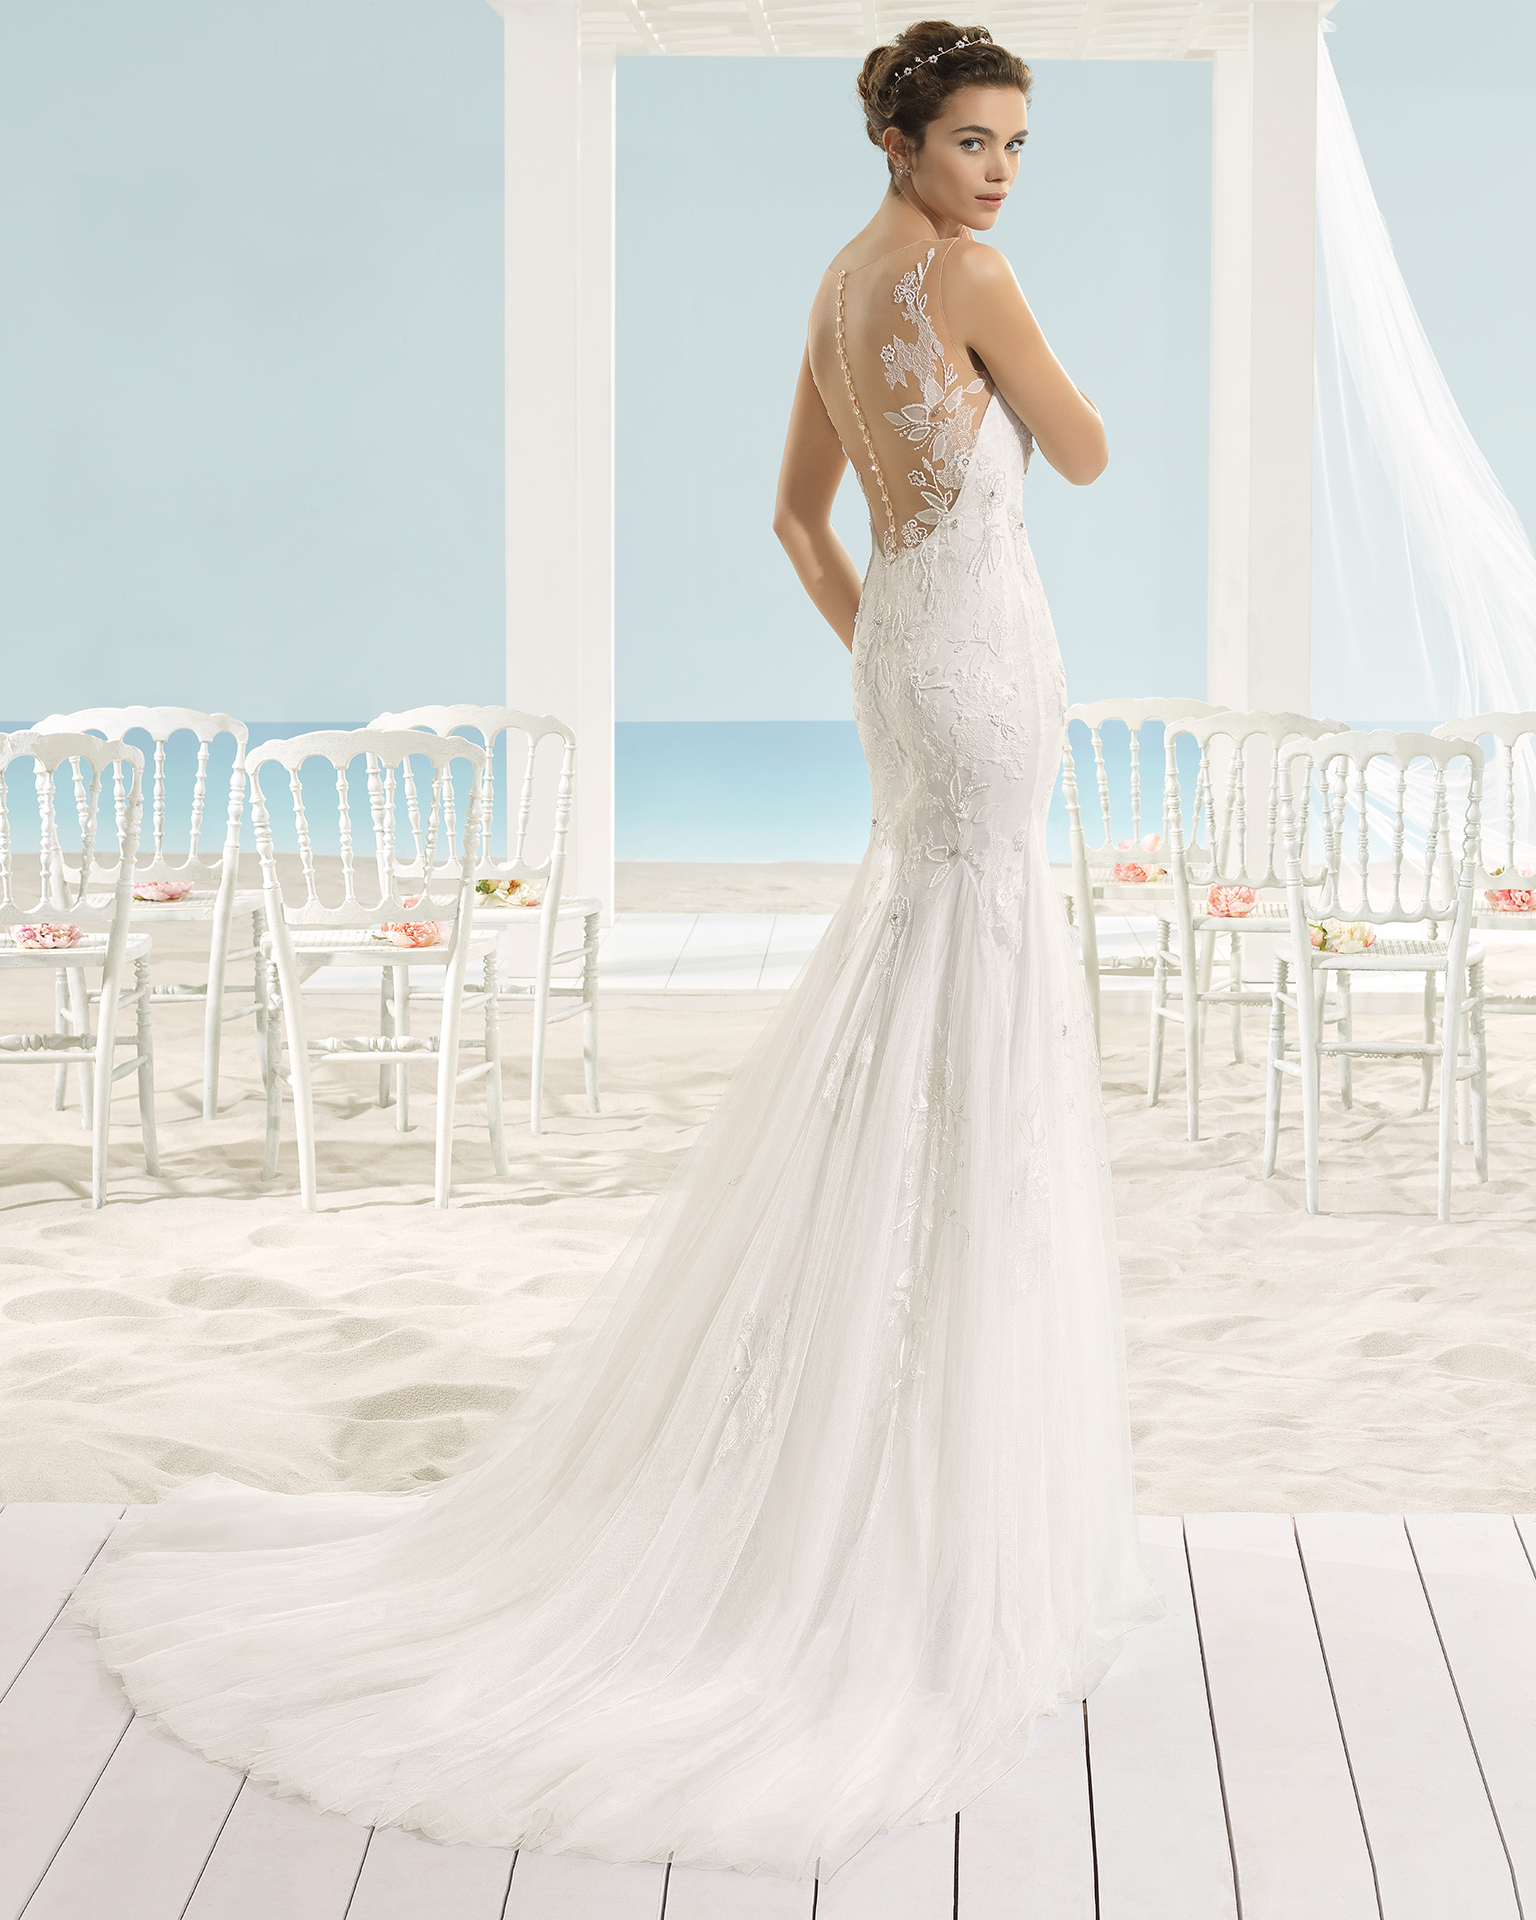 Beach Wedding Dresses Chicago : Barcelona xaman beach bridal wedding dress gown chicago g